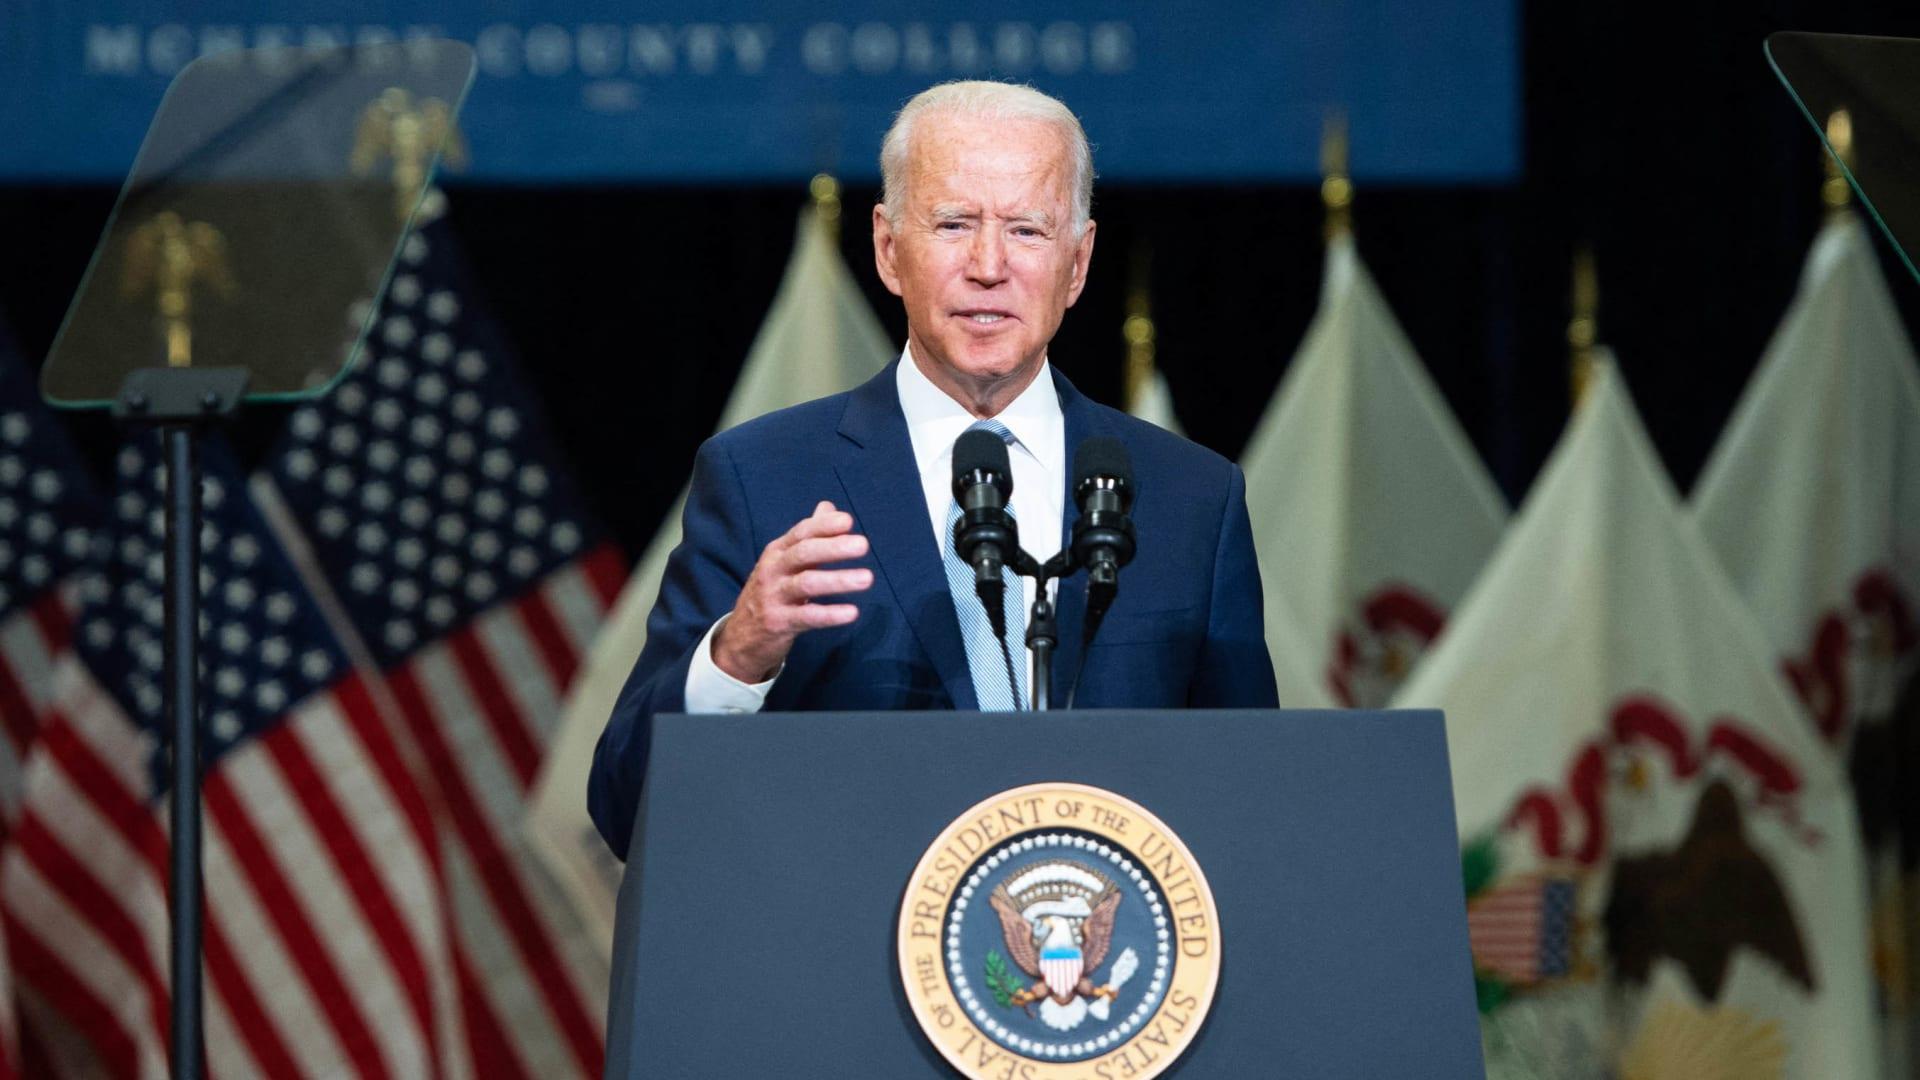 President Joe Biden speaks about his Build Back Better economic plans in Crystal Lake, Illinois, on July 7.